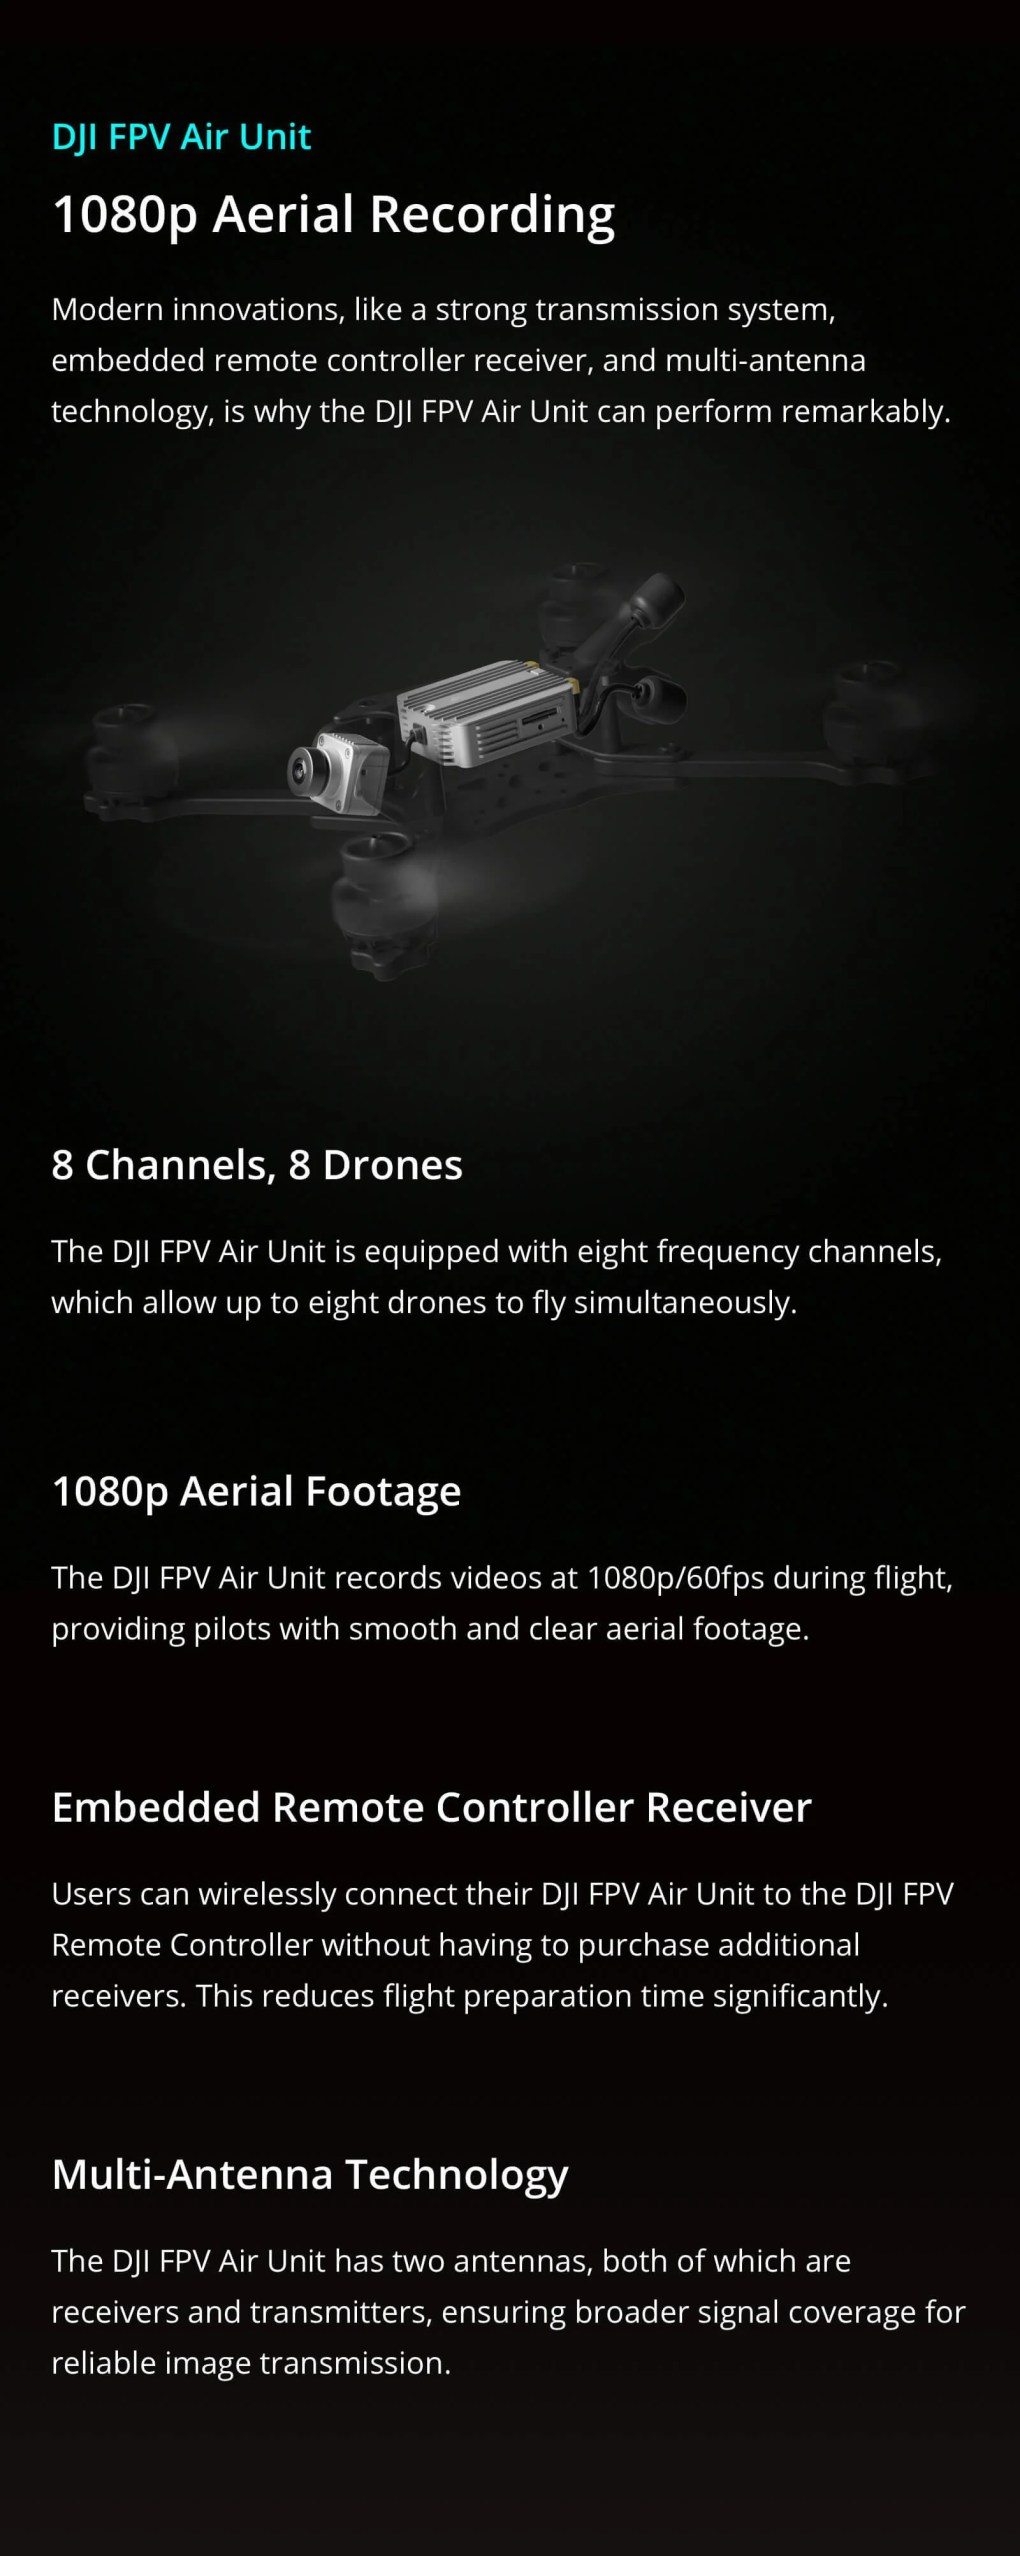 DJI Air unit dual antennas